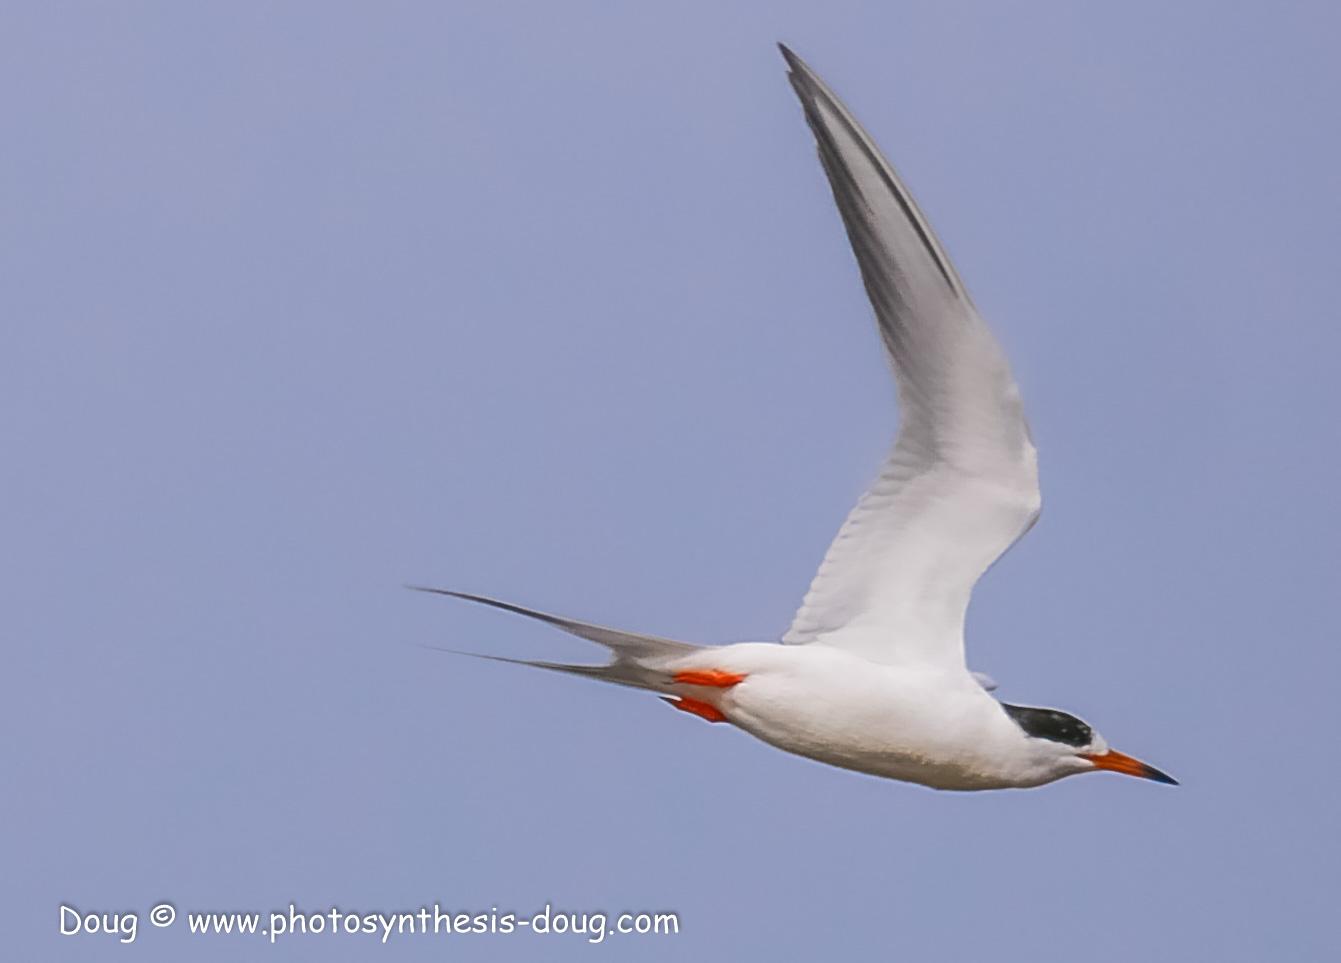 Merkle WLR April birds-1040046.JPG